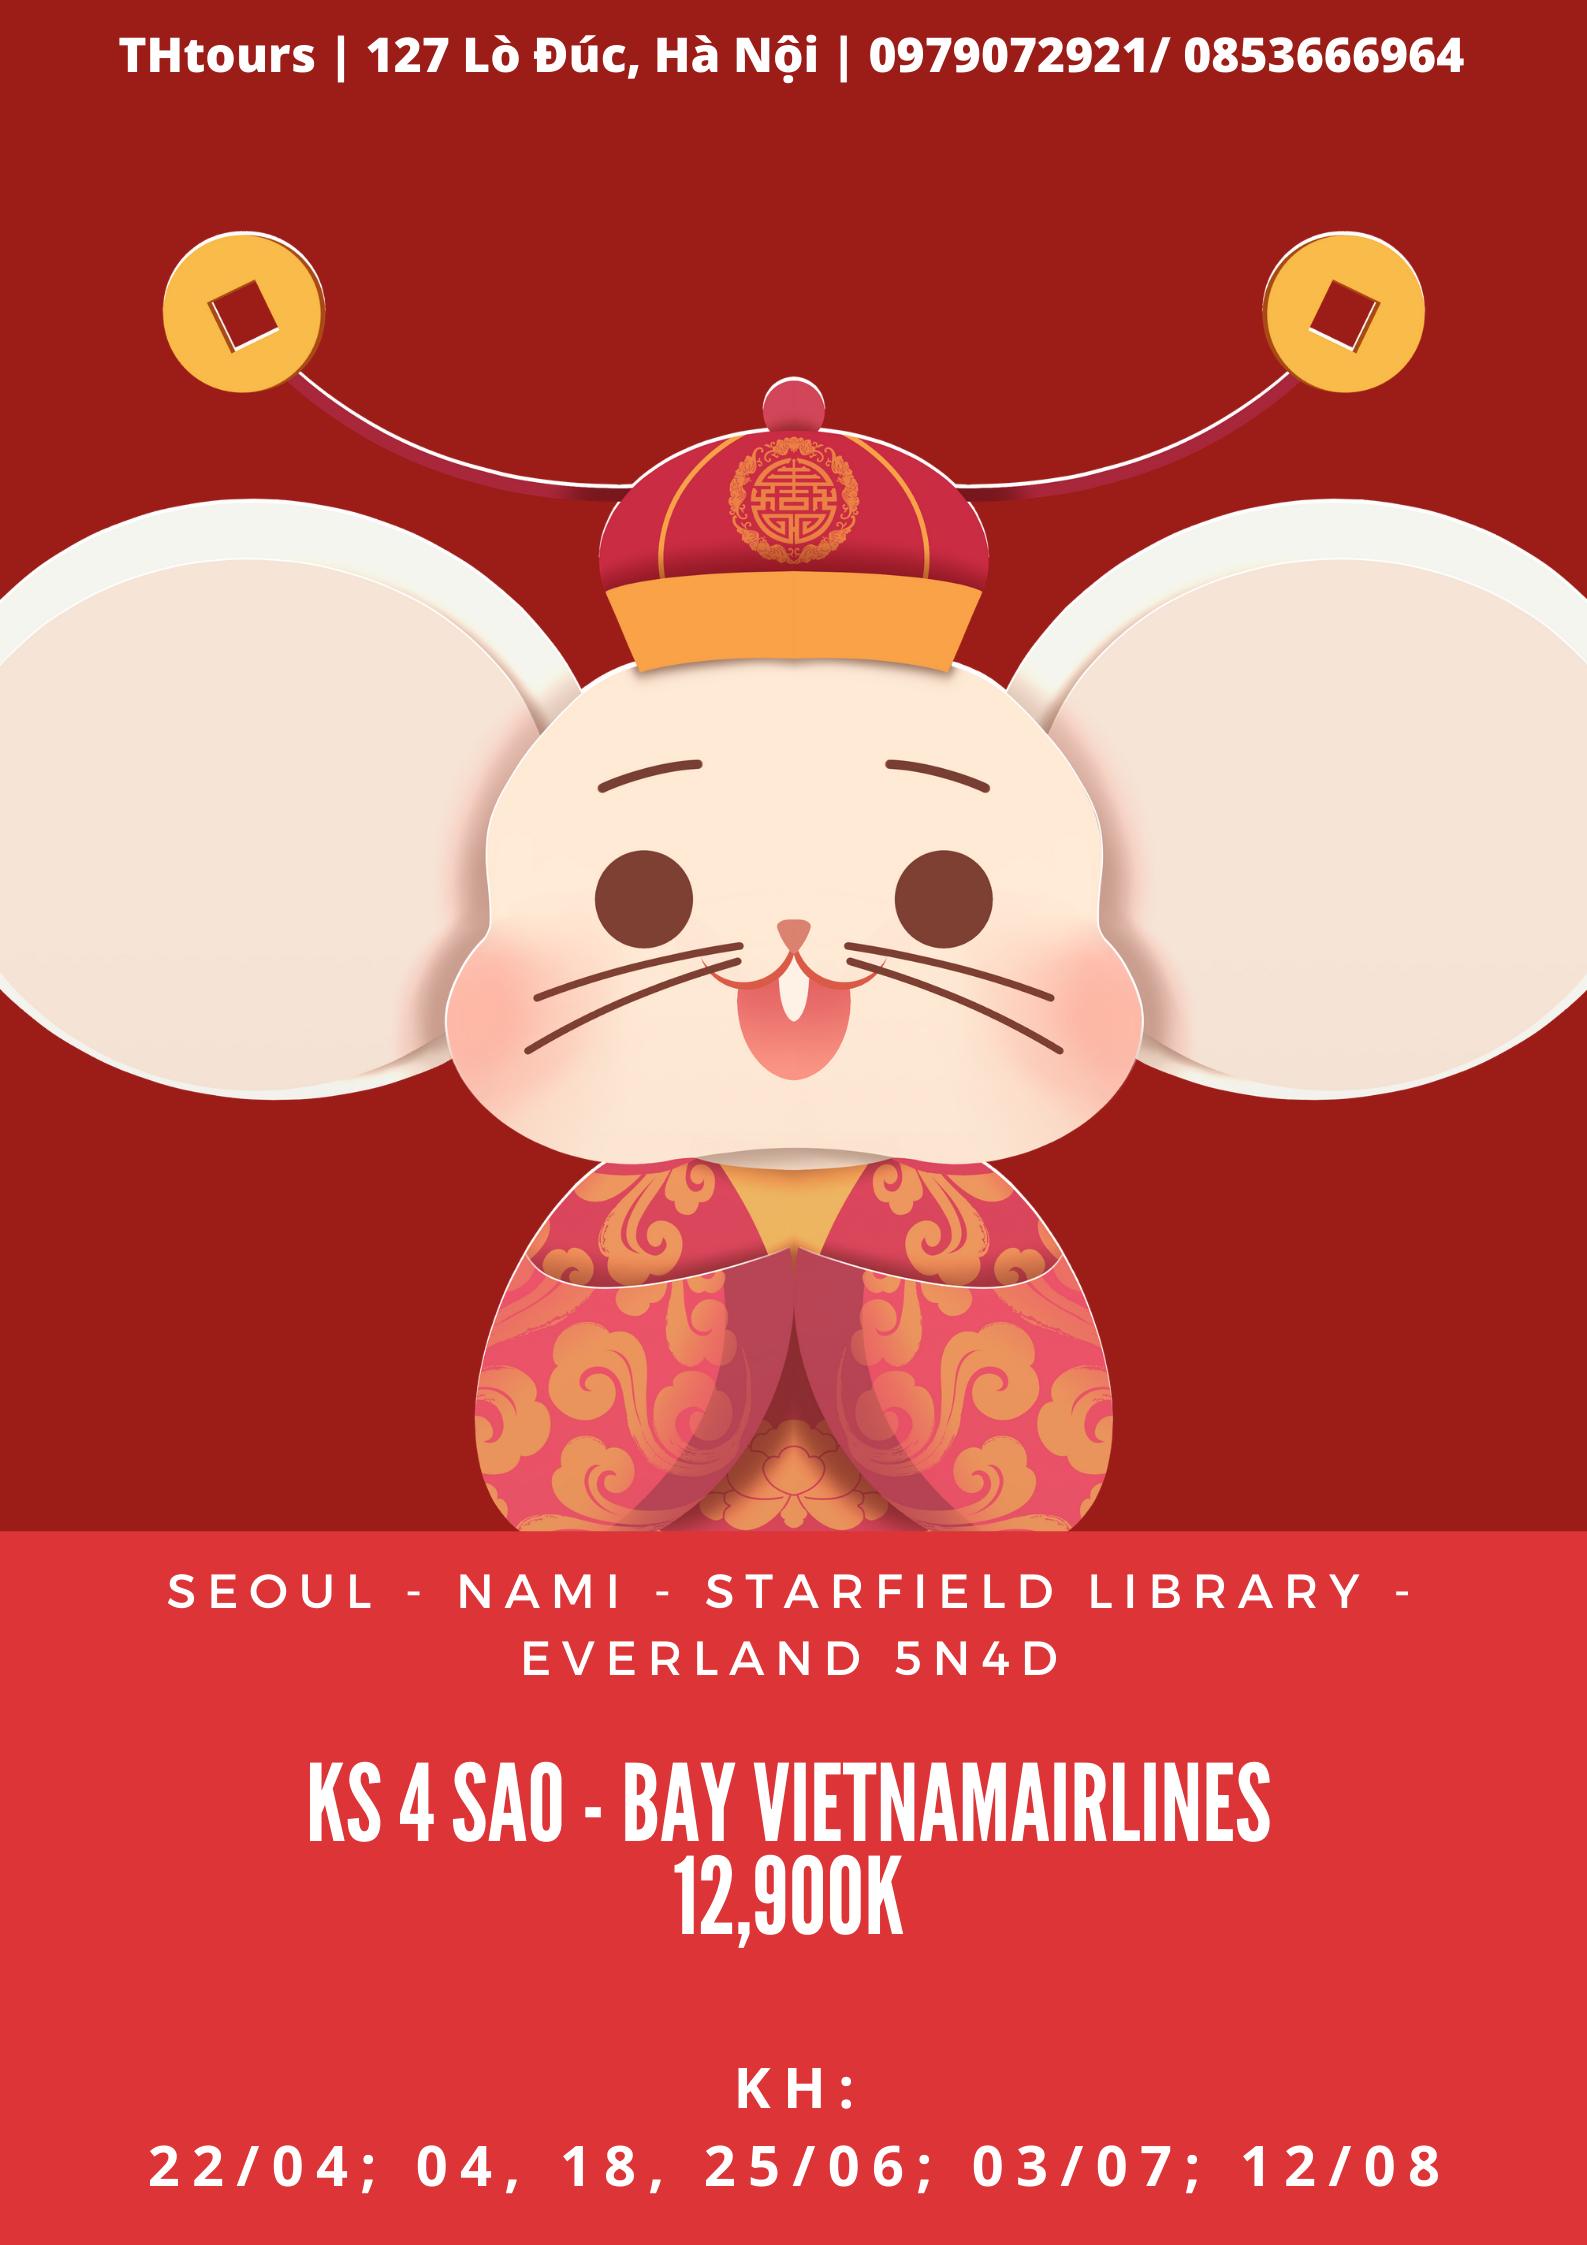 Series Han Quoc VNA